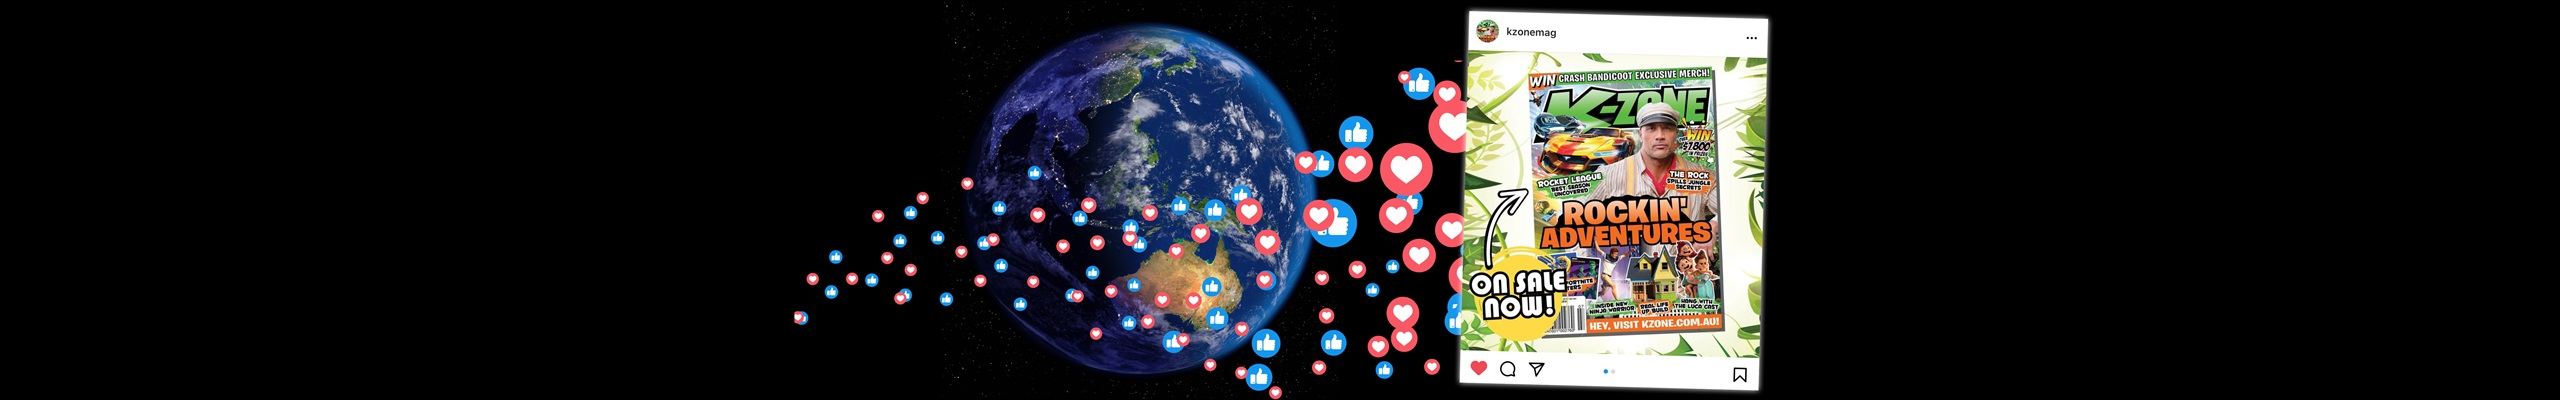 Stay Safe on World Social Media Day!